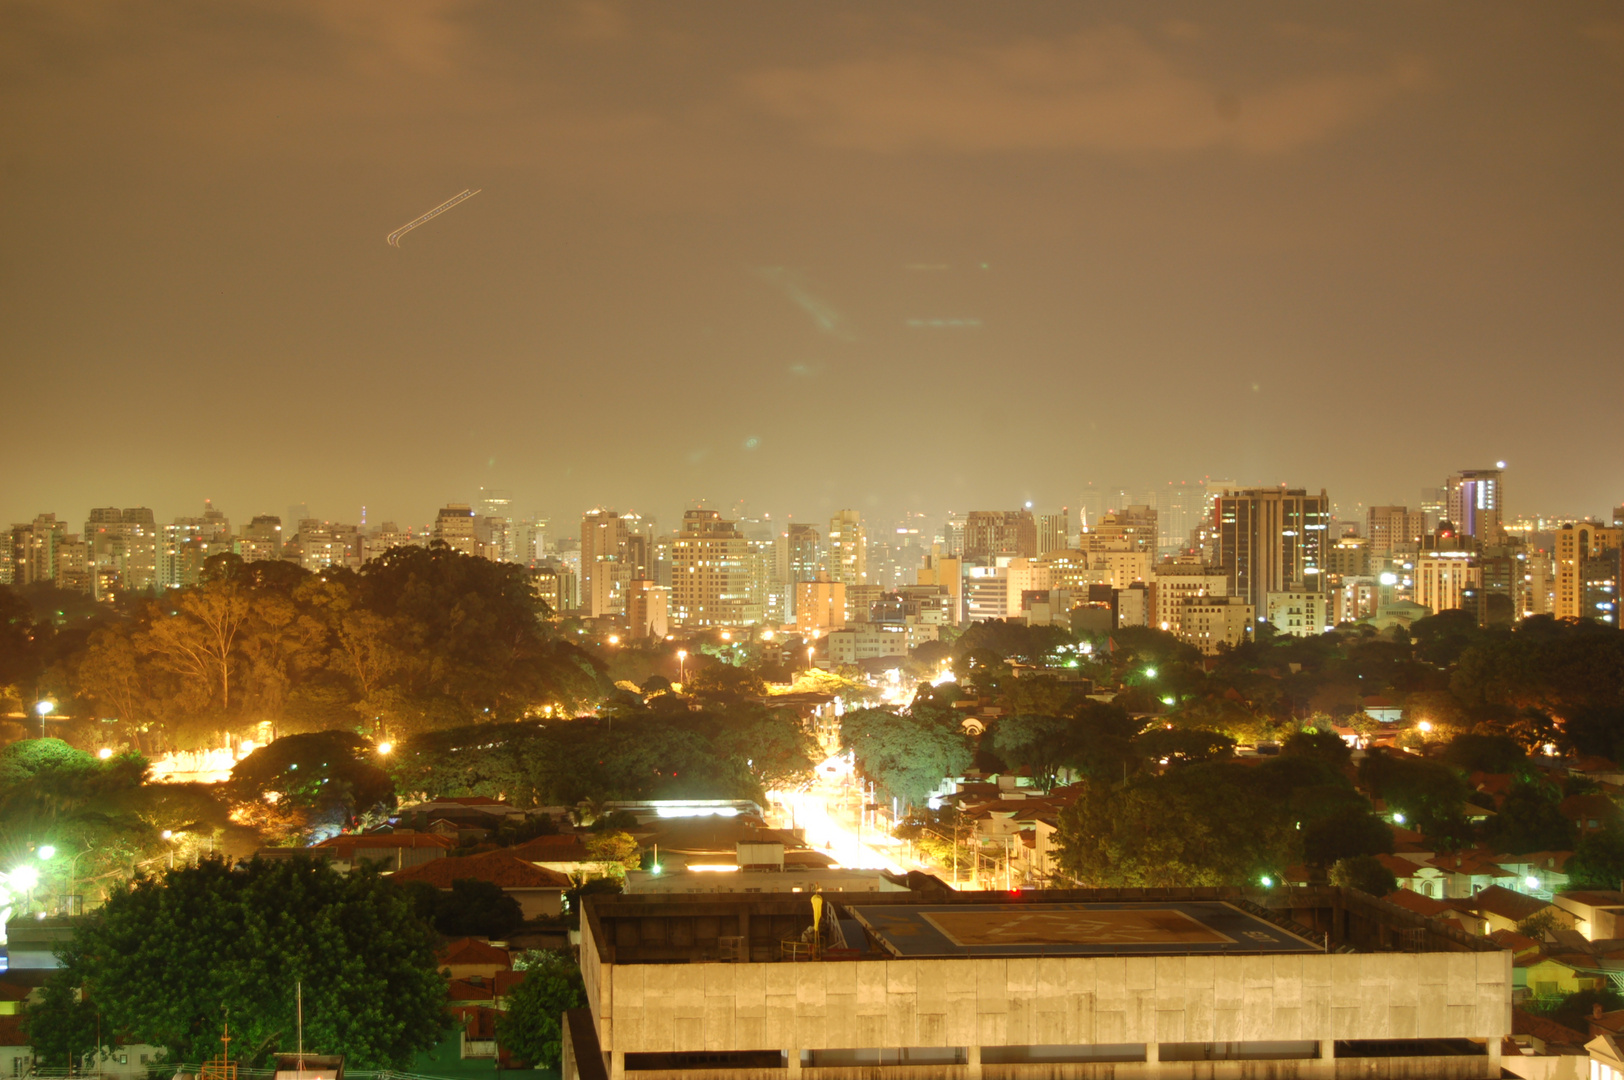 Sao Paulo by night